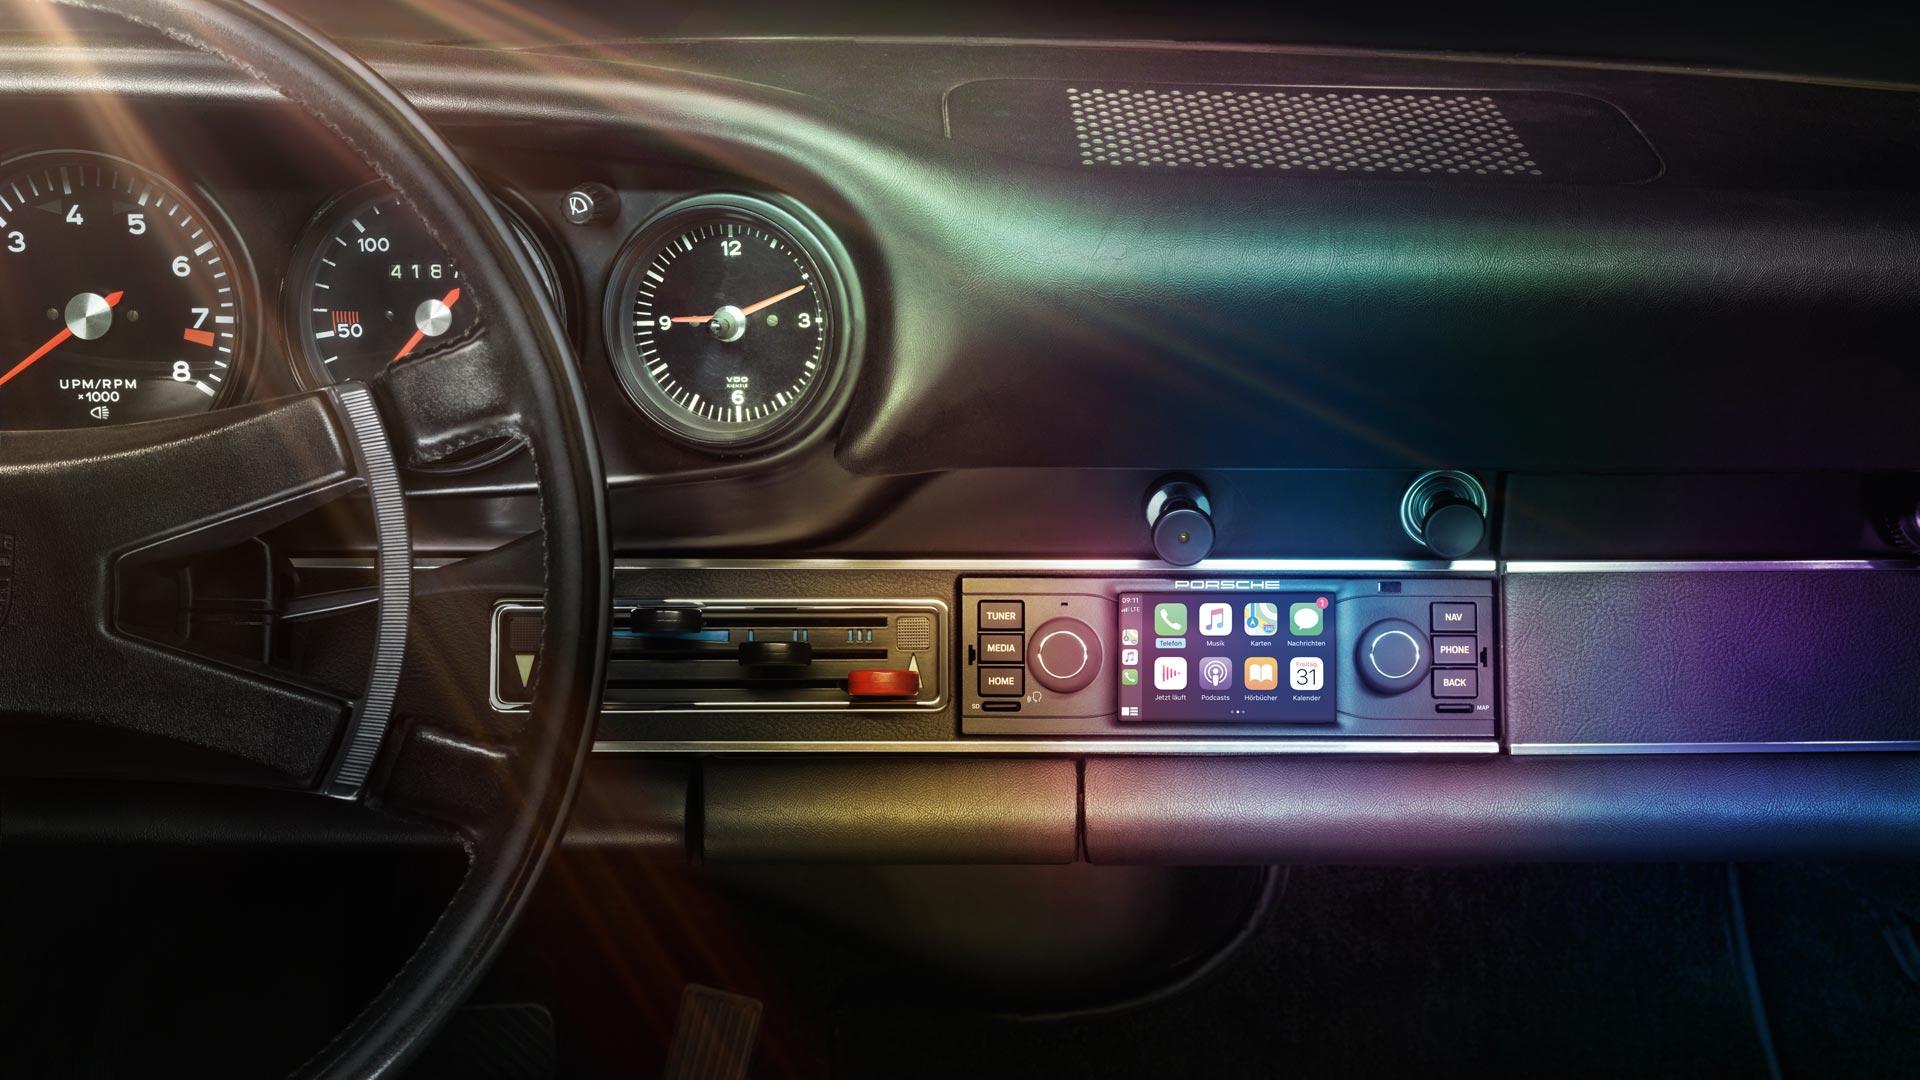 Porsche Classic PCCM Touchscreen